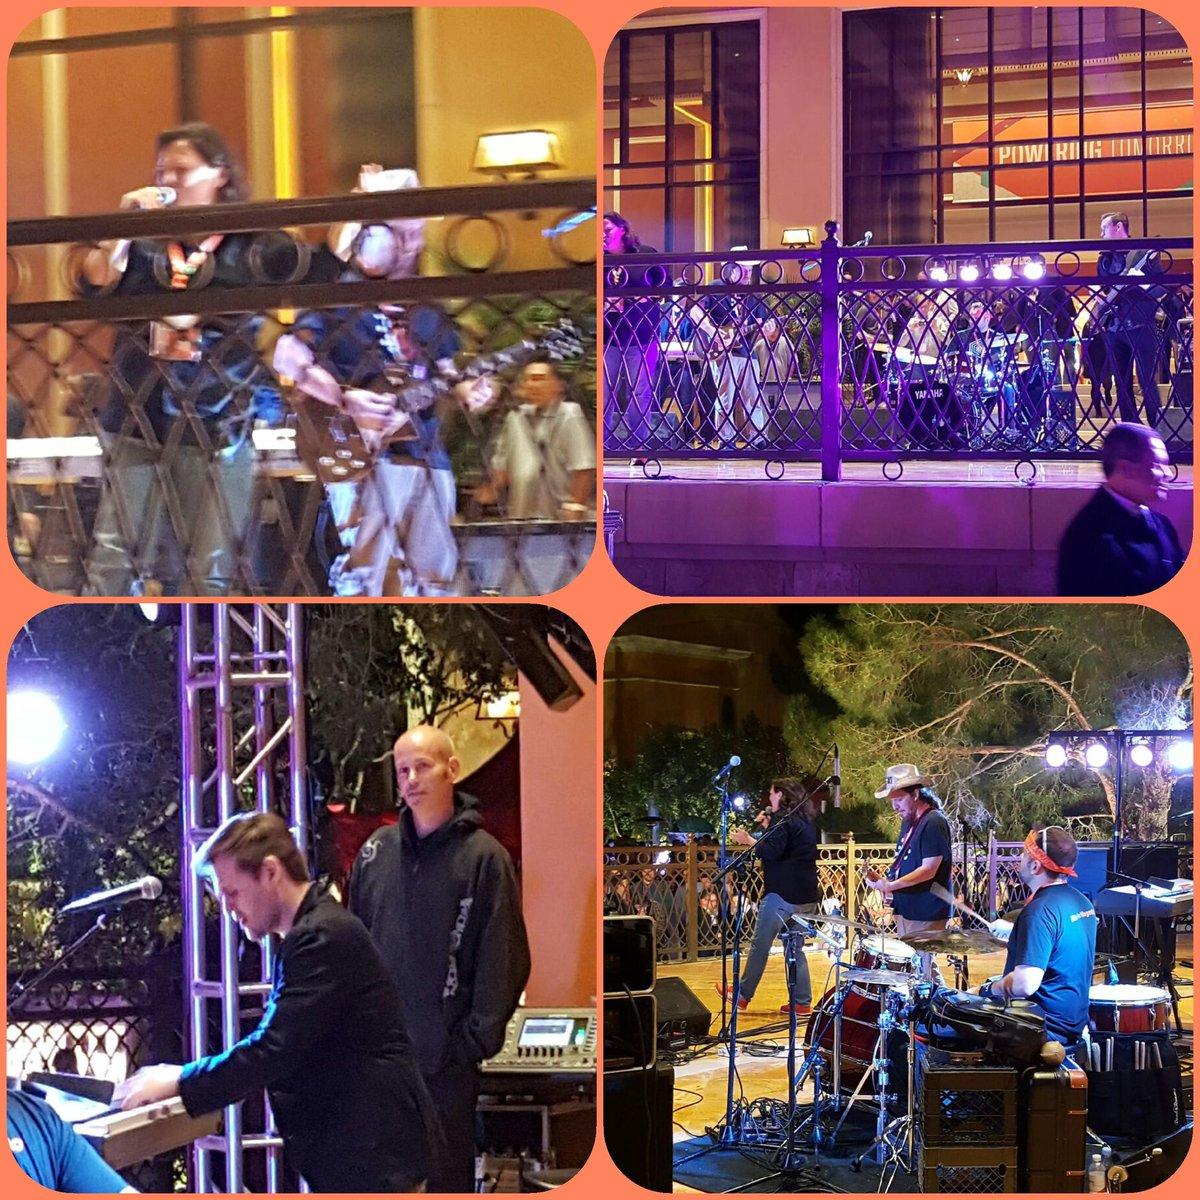 paradoxlabs: #Magentoimagine rock stars! @magento @SteveAtMagento https://t.co/C1sC7AvwyO